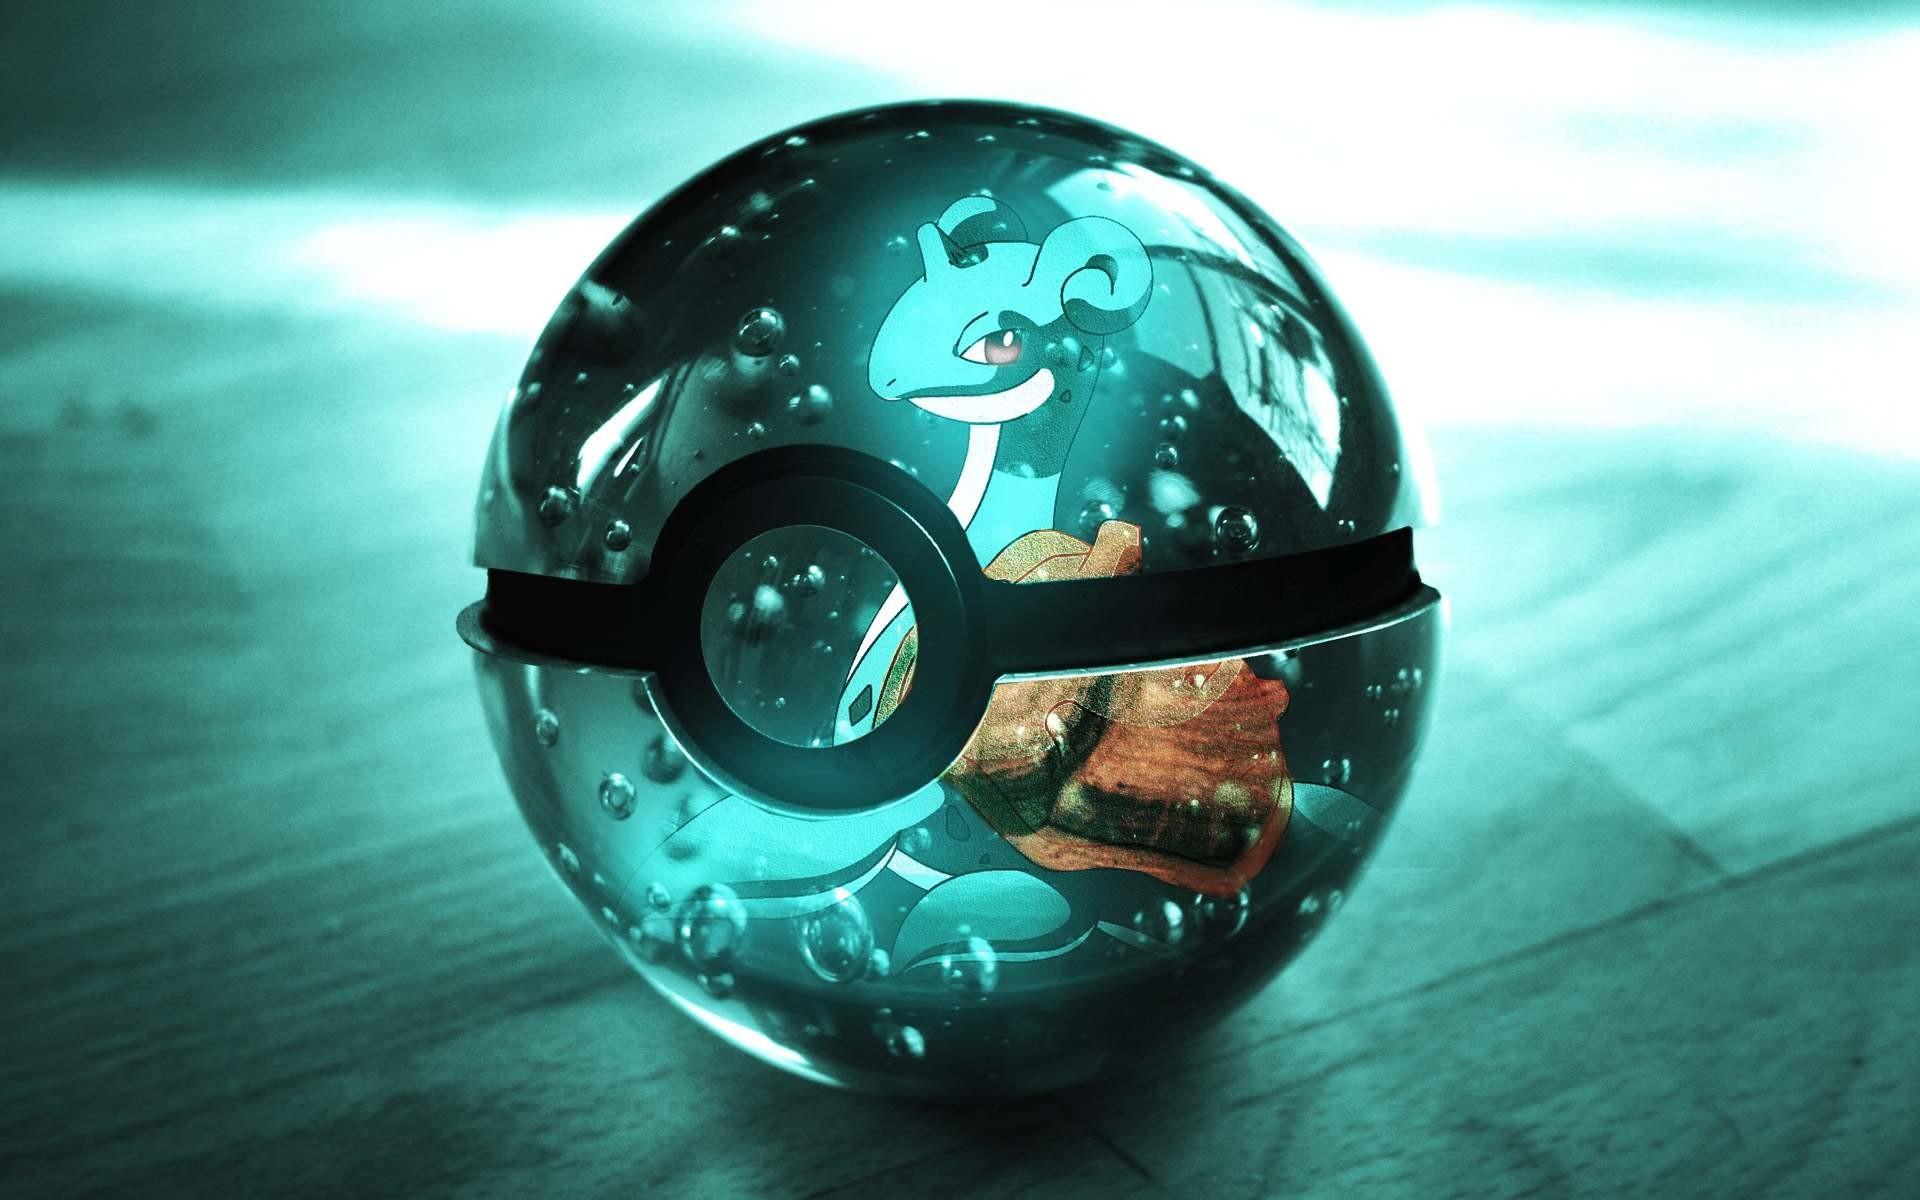 Shiny Pokeball Wallpaper from Pokemon. Shiny Pokeball with Lapras on it